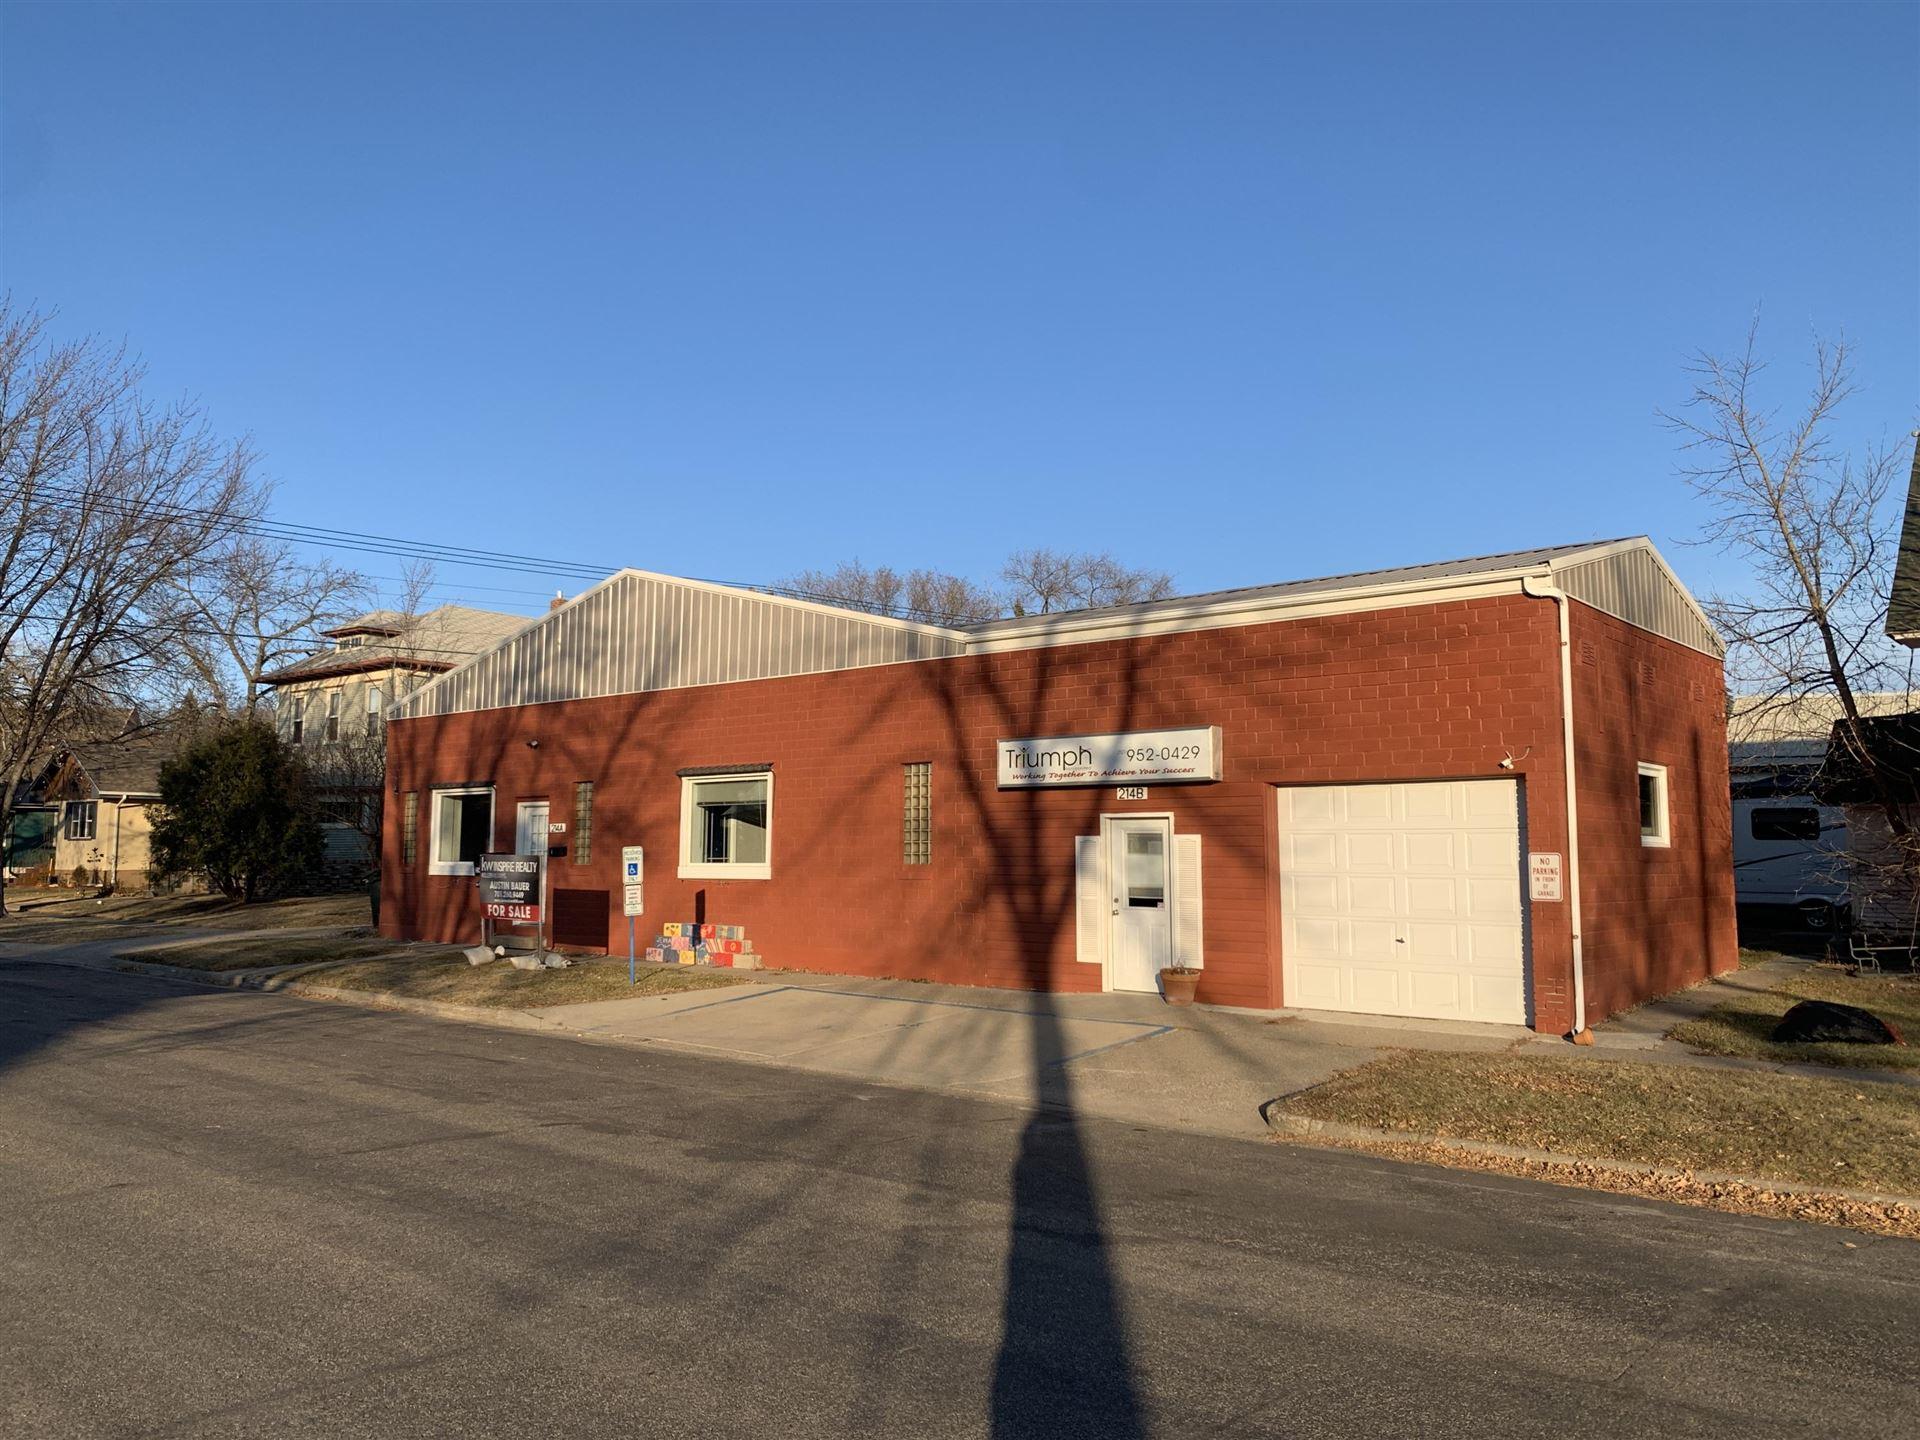 Photo for 214 6th Avenue NE, Jamestown, ND 58401 (MLS # 20-639)